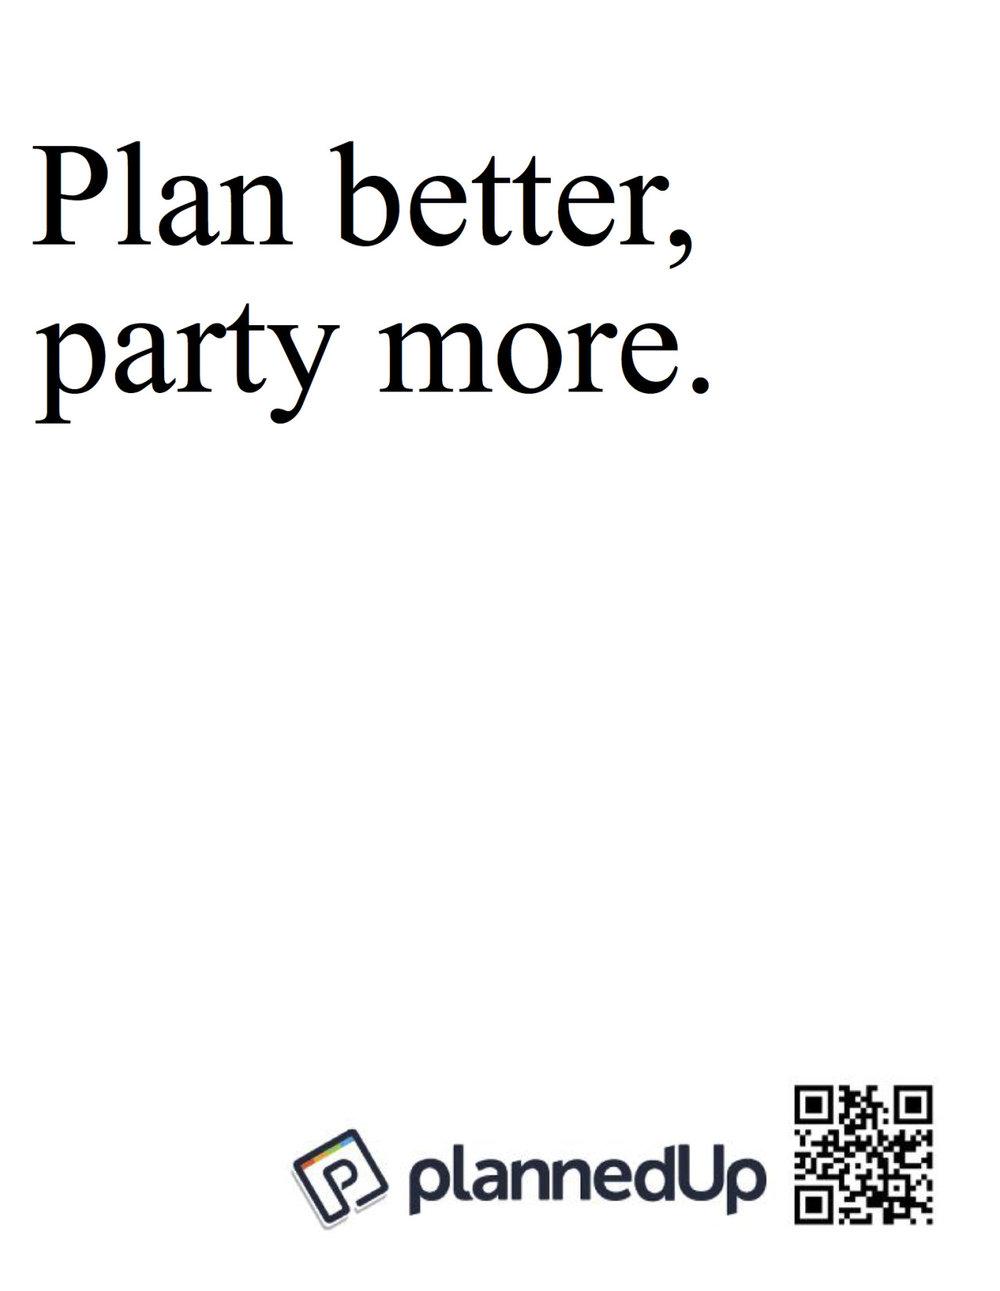 plannedup7.jpg